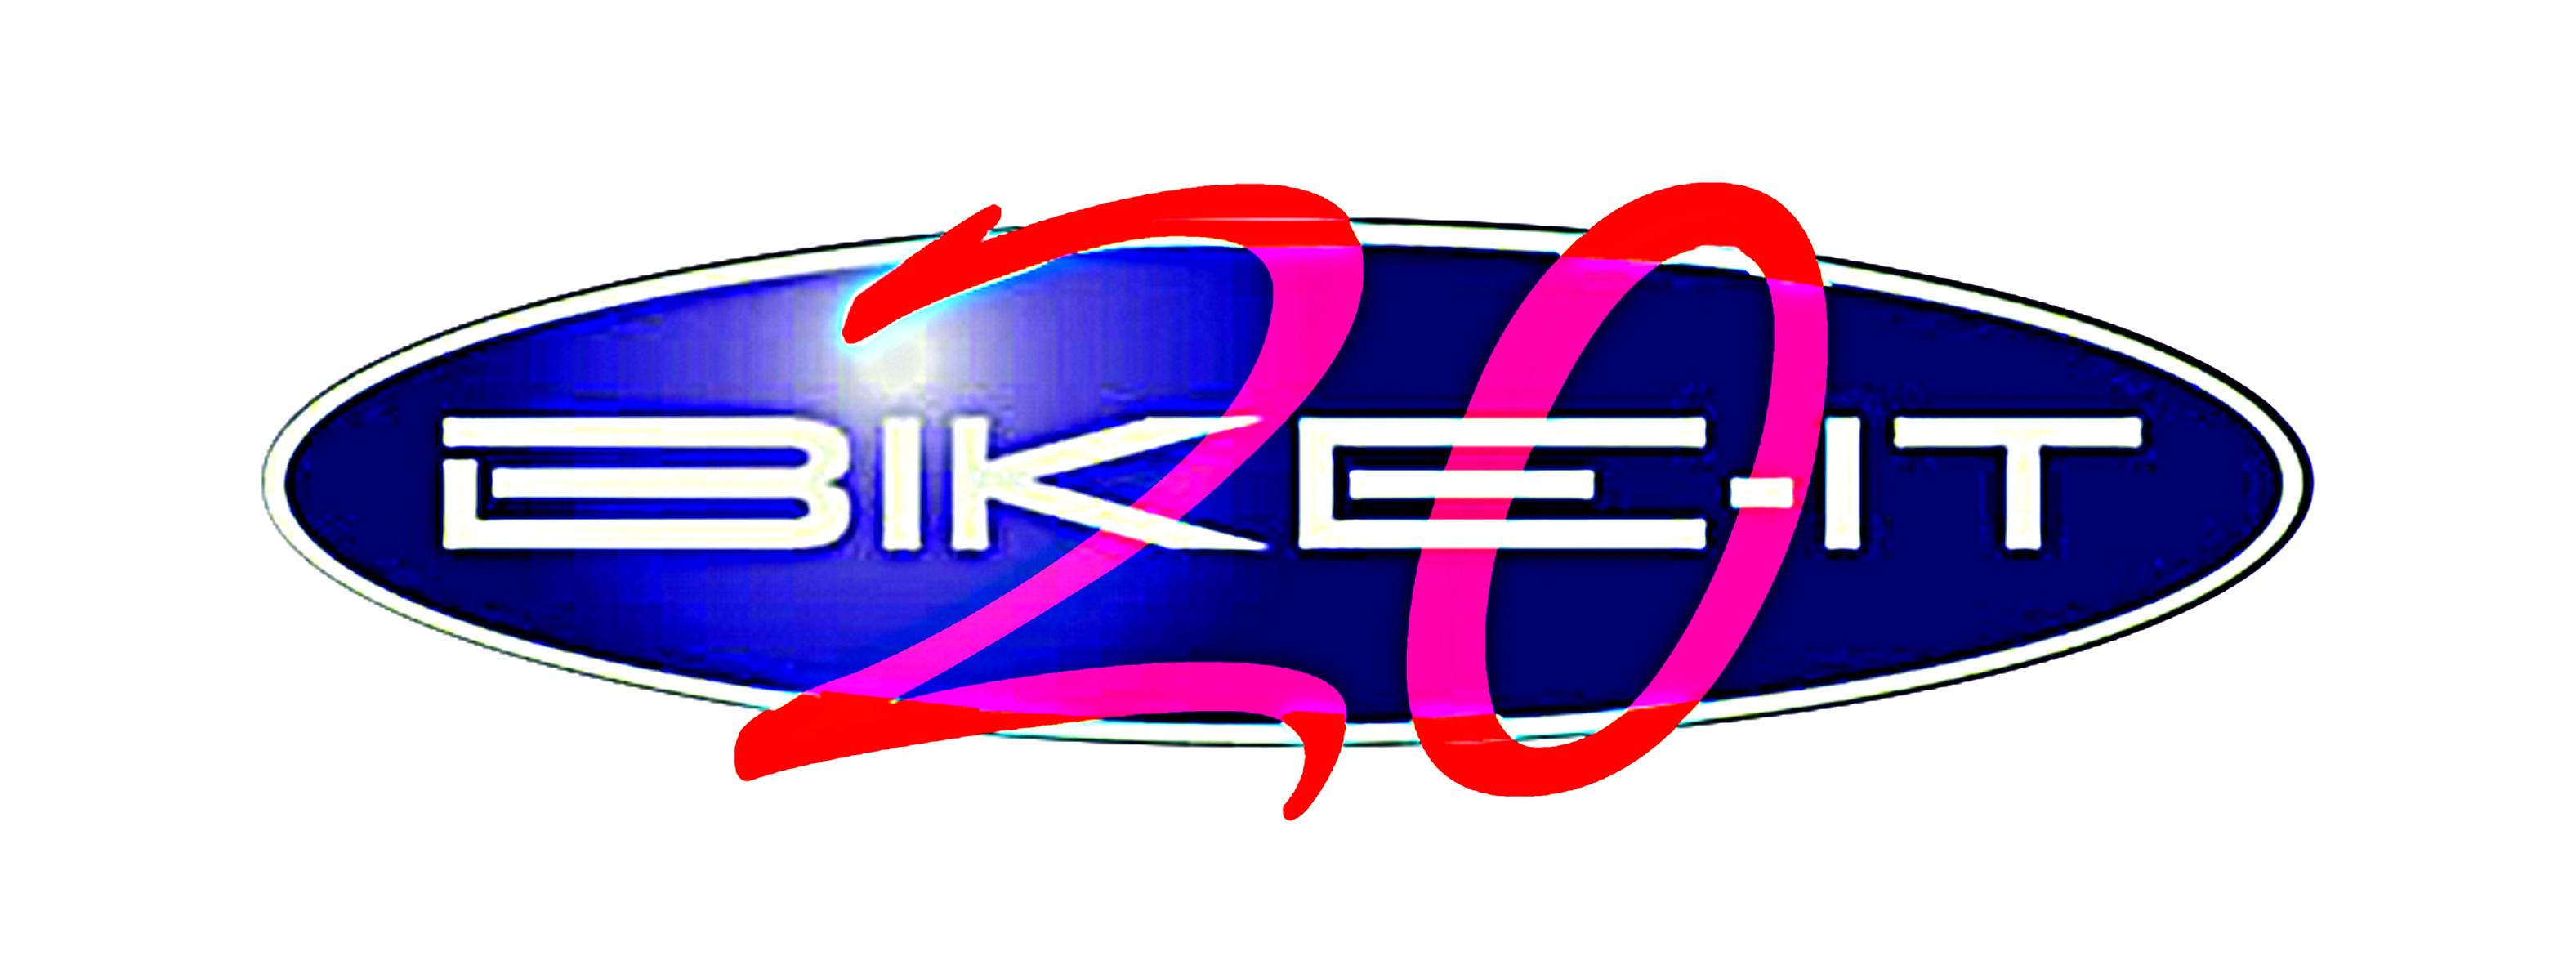 Bike-it 20th Anniversary